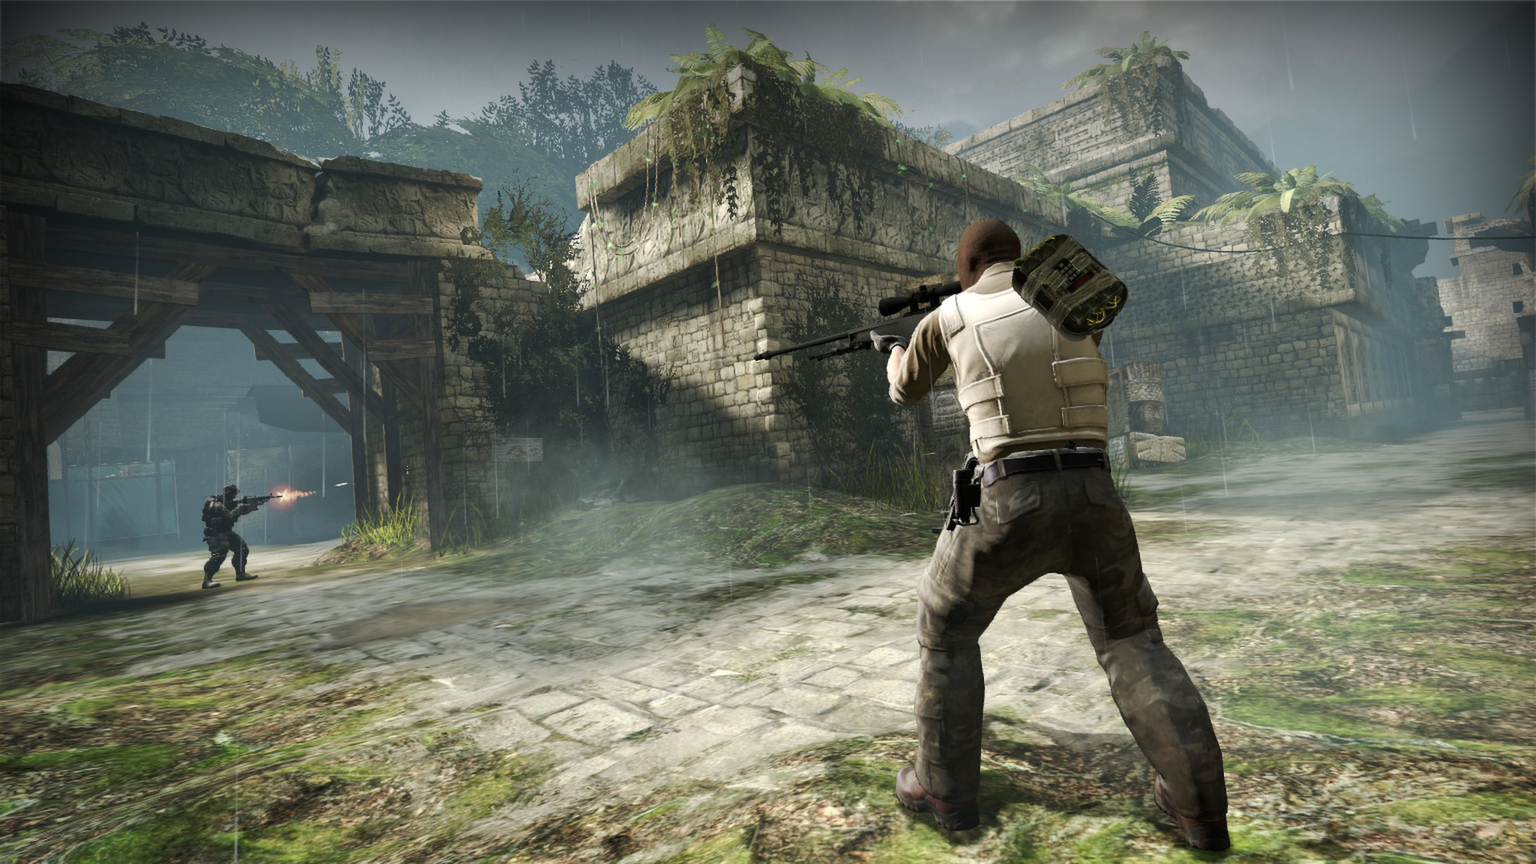 Counter strike online 2 release date